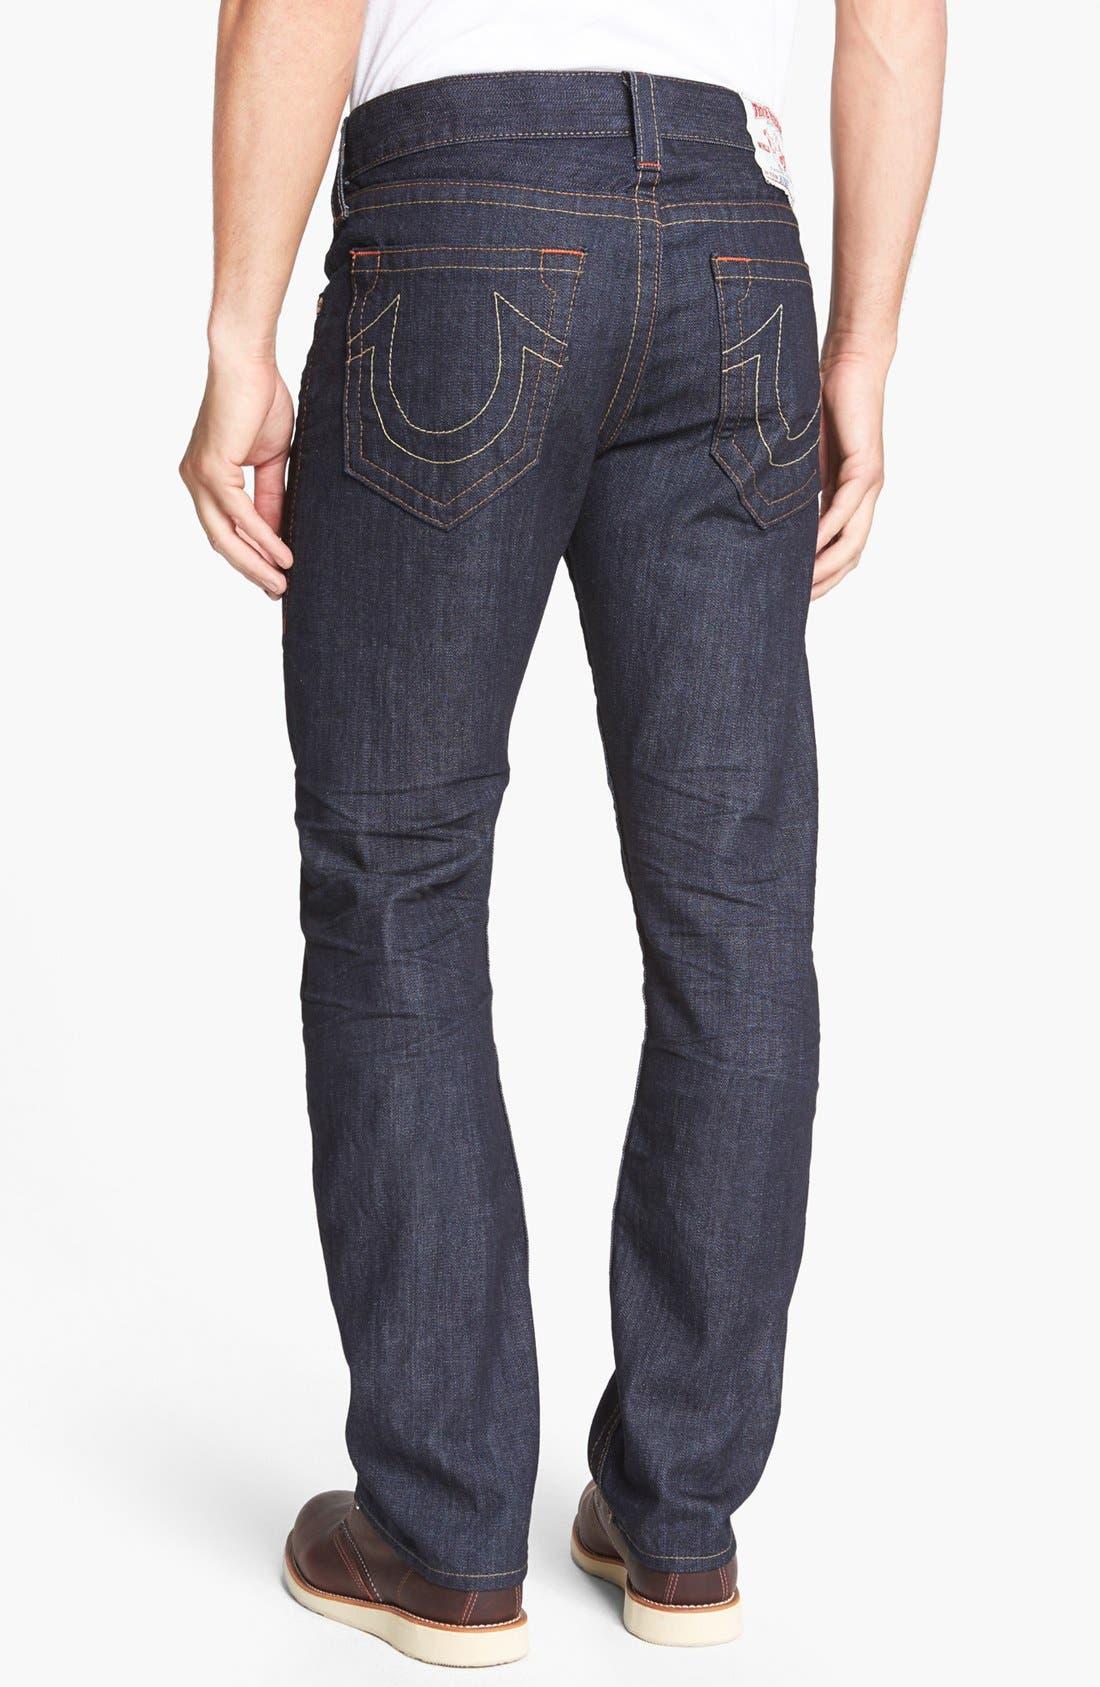 Main Image - True Religion Brand Jeans 'Bobby' Straight Leg Jeans (Bz Inglorious)